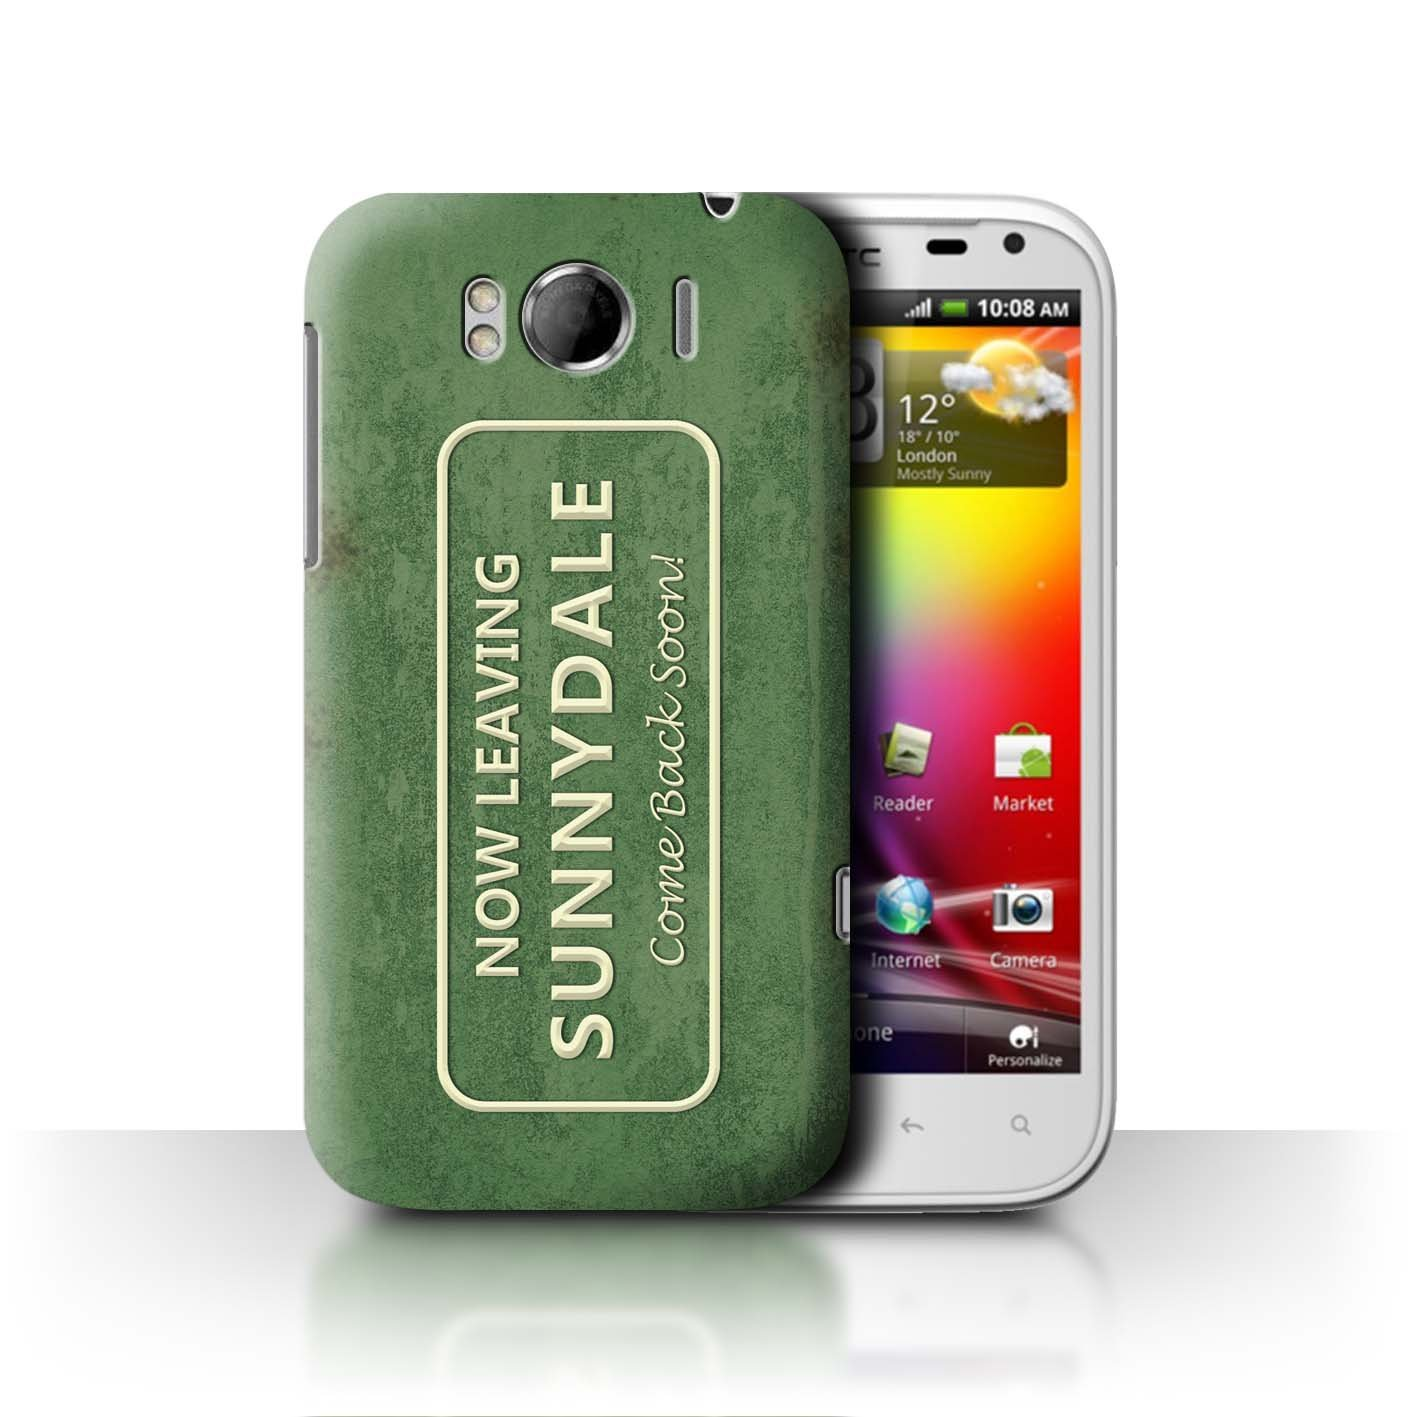 low priced afa01 ca8cb Amazon.com: STUFF4 Phone Case/Cover for HTC Sensation XL/G21 / Town ...